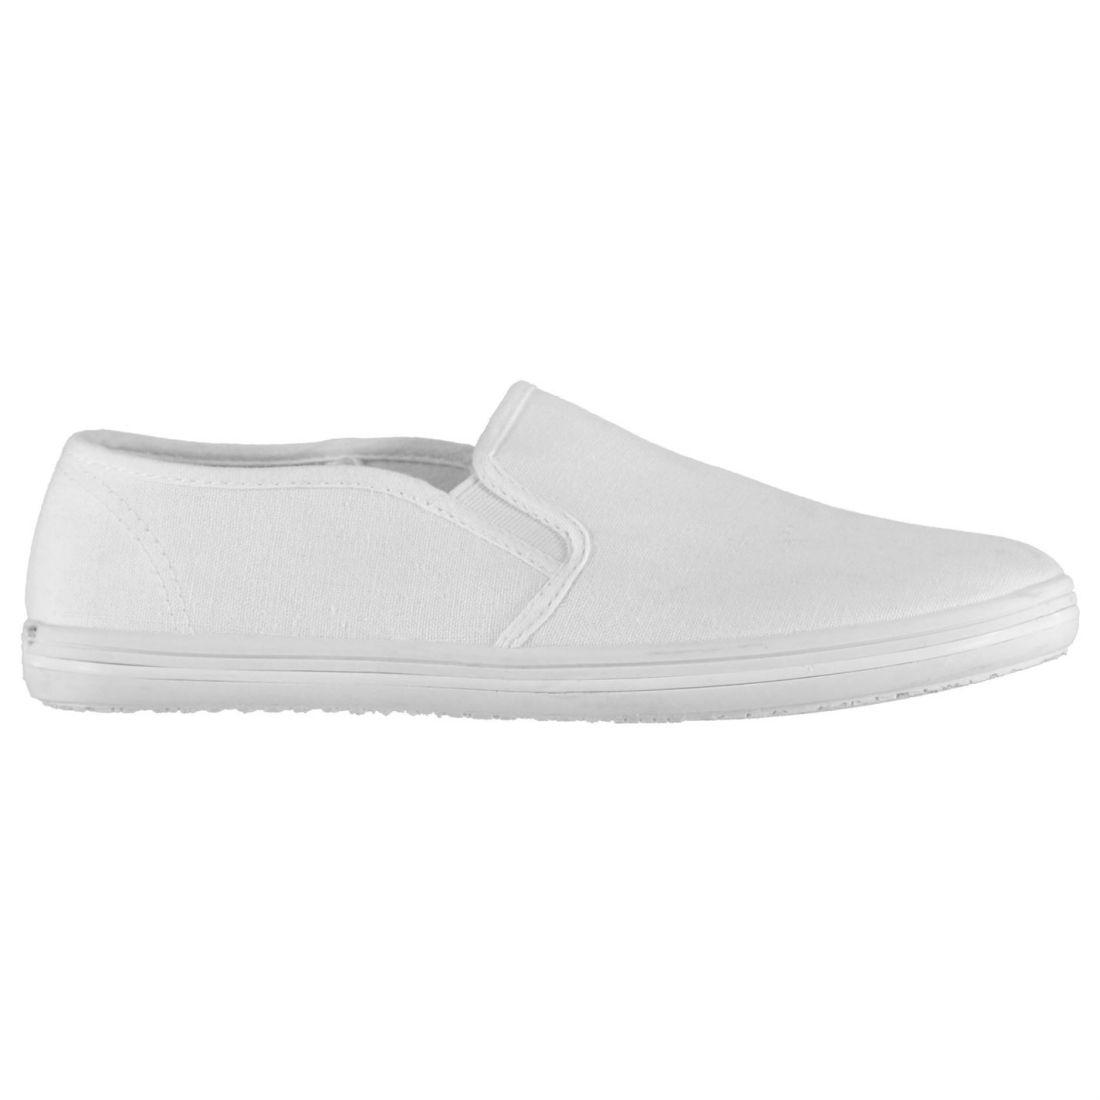 e60b0e133d5 SLAZENGER YOUNGSTER CANVAS Slip On Shoes Childrens Pumps Comfortable ...